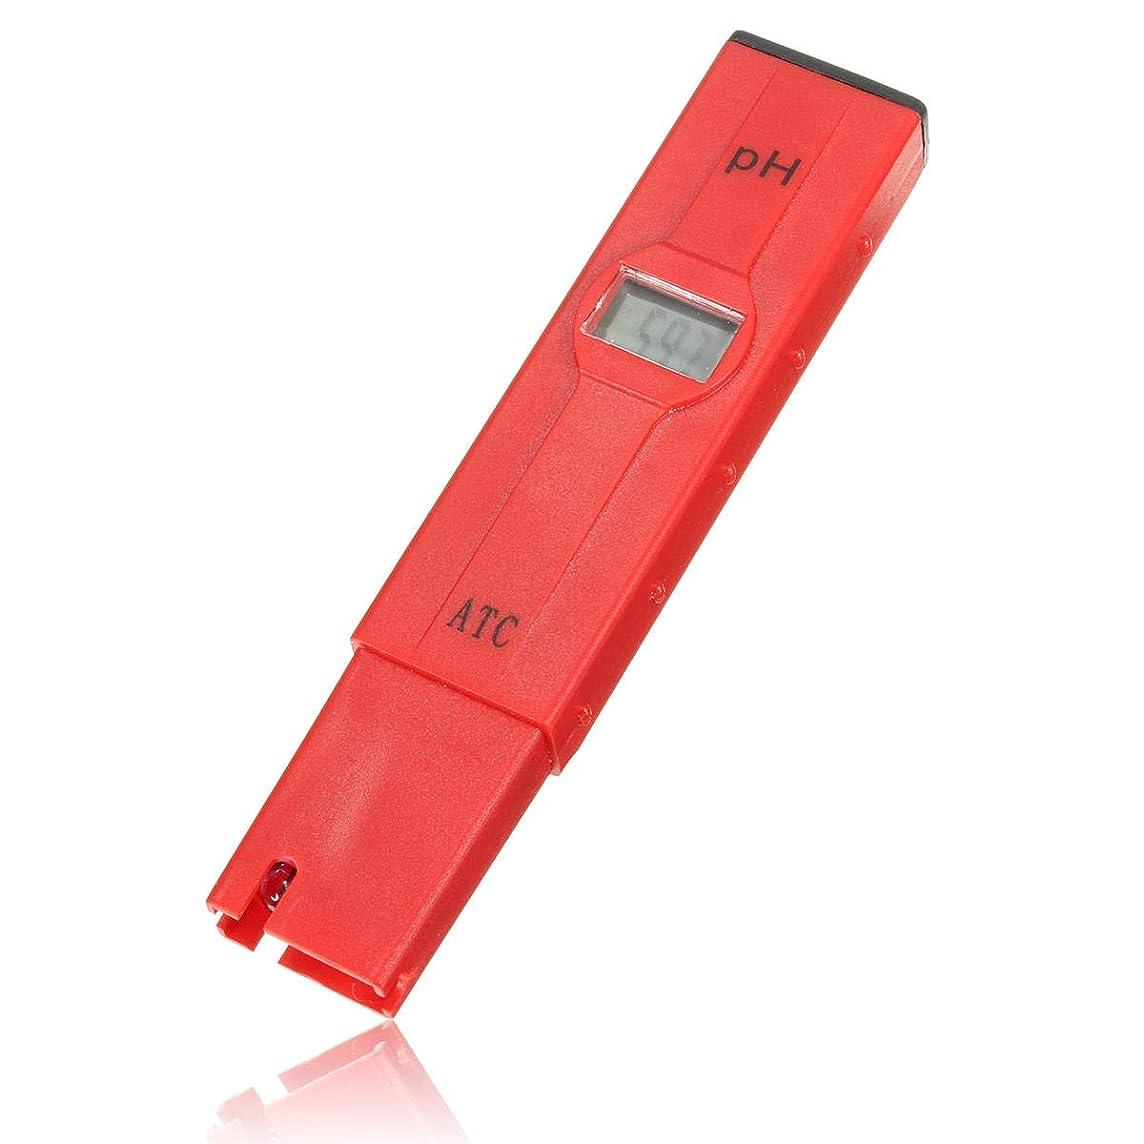 Pocket Digital Tester Meter Pen Monitor Aquarium Pool Water Measuring - Nature Element Measurements pH\/TDS\/ORP\/TEMP\/PPM\/EC Tester - 1 x Upside Down Hanging Planter Kit